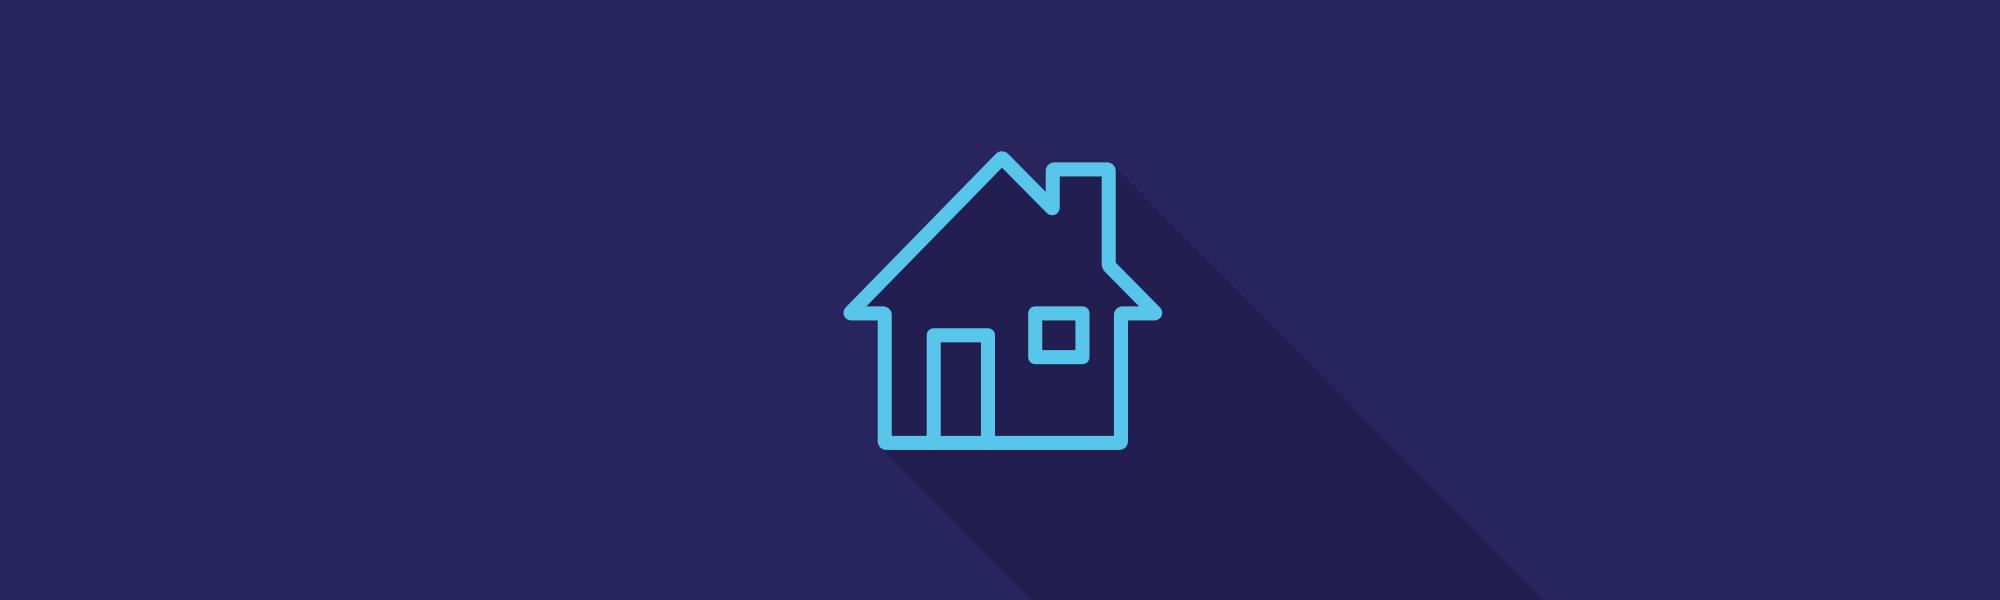 Full width banner viewing properties